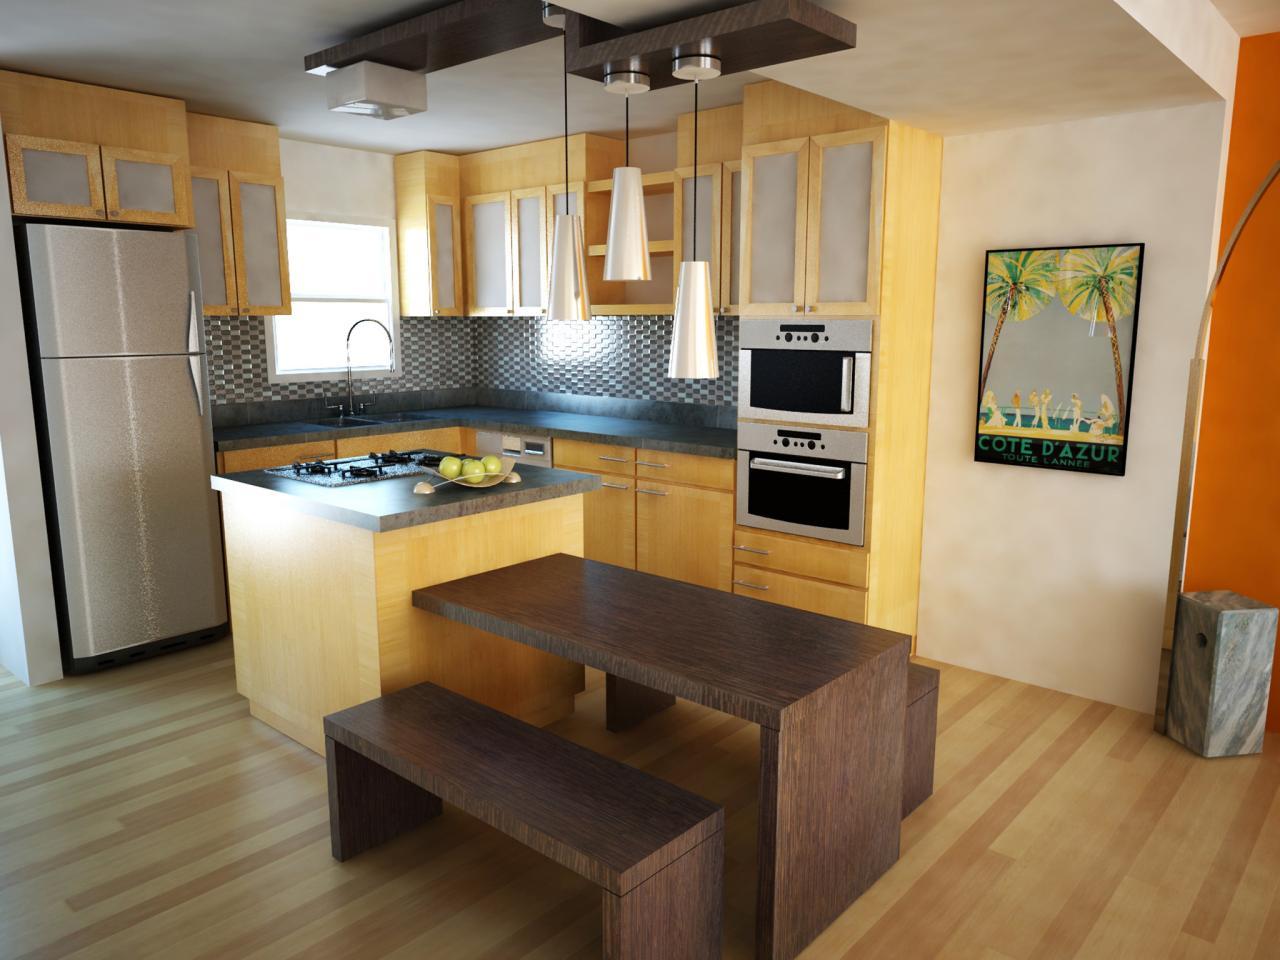 rms_pilonieta-moderne-maleriske-kitchen_s4x3-jpg-rend-hgtvcom-1280-960